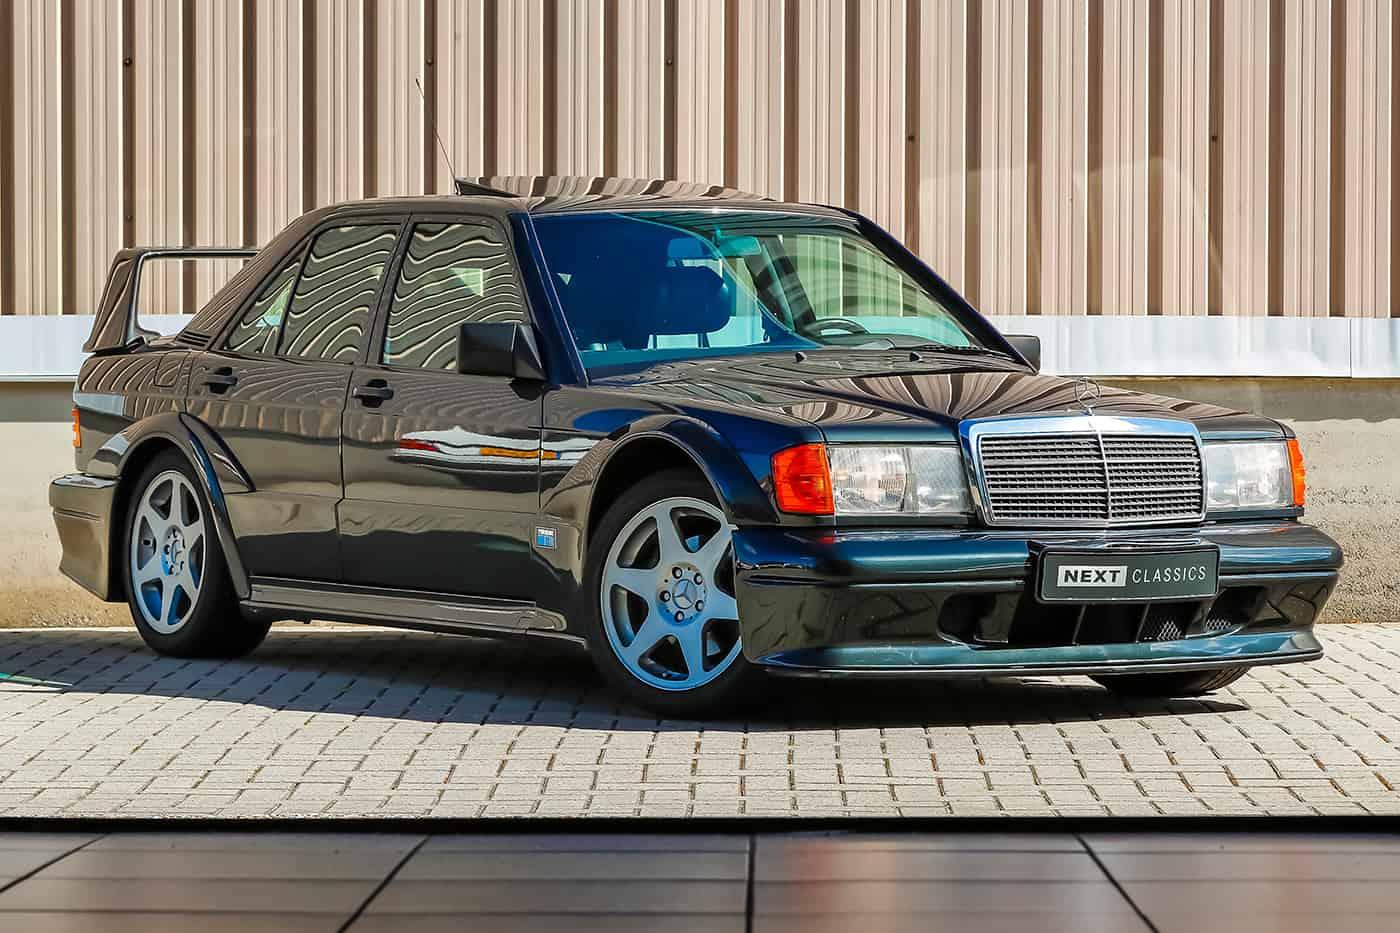 Mercedes 190E Evo II for sale